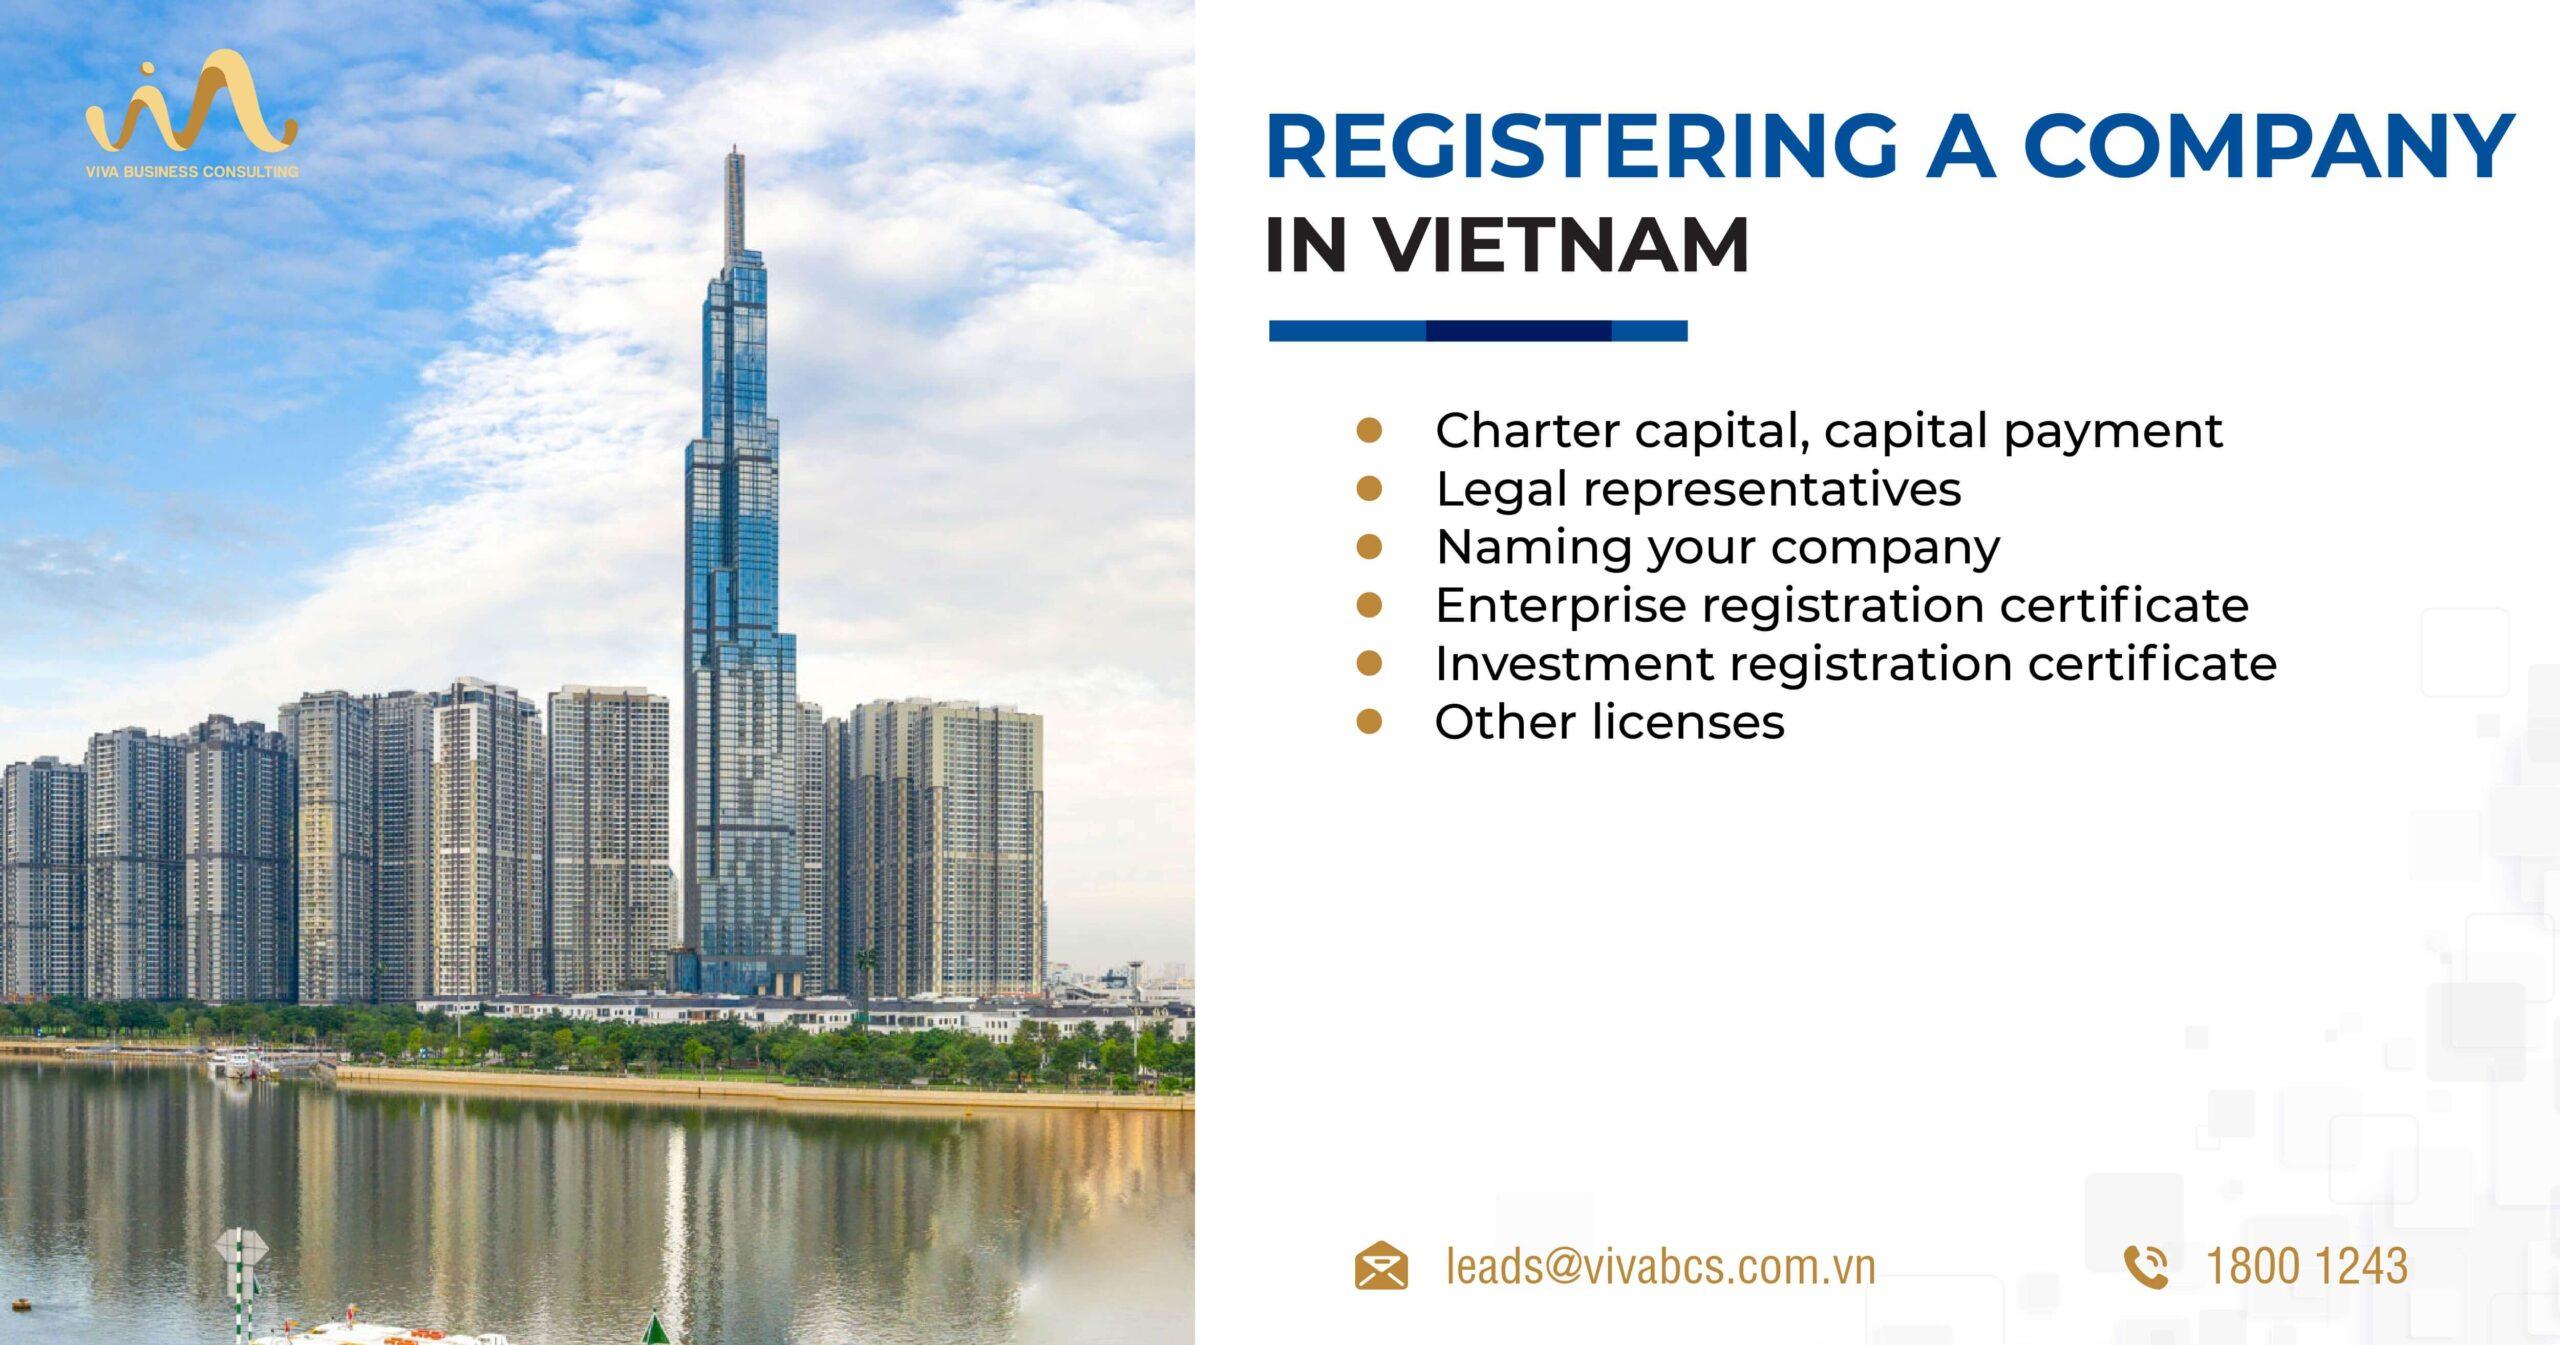 Registering a company in Vietnam